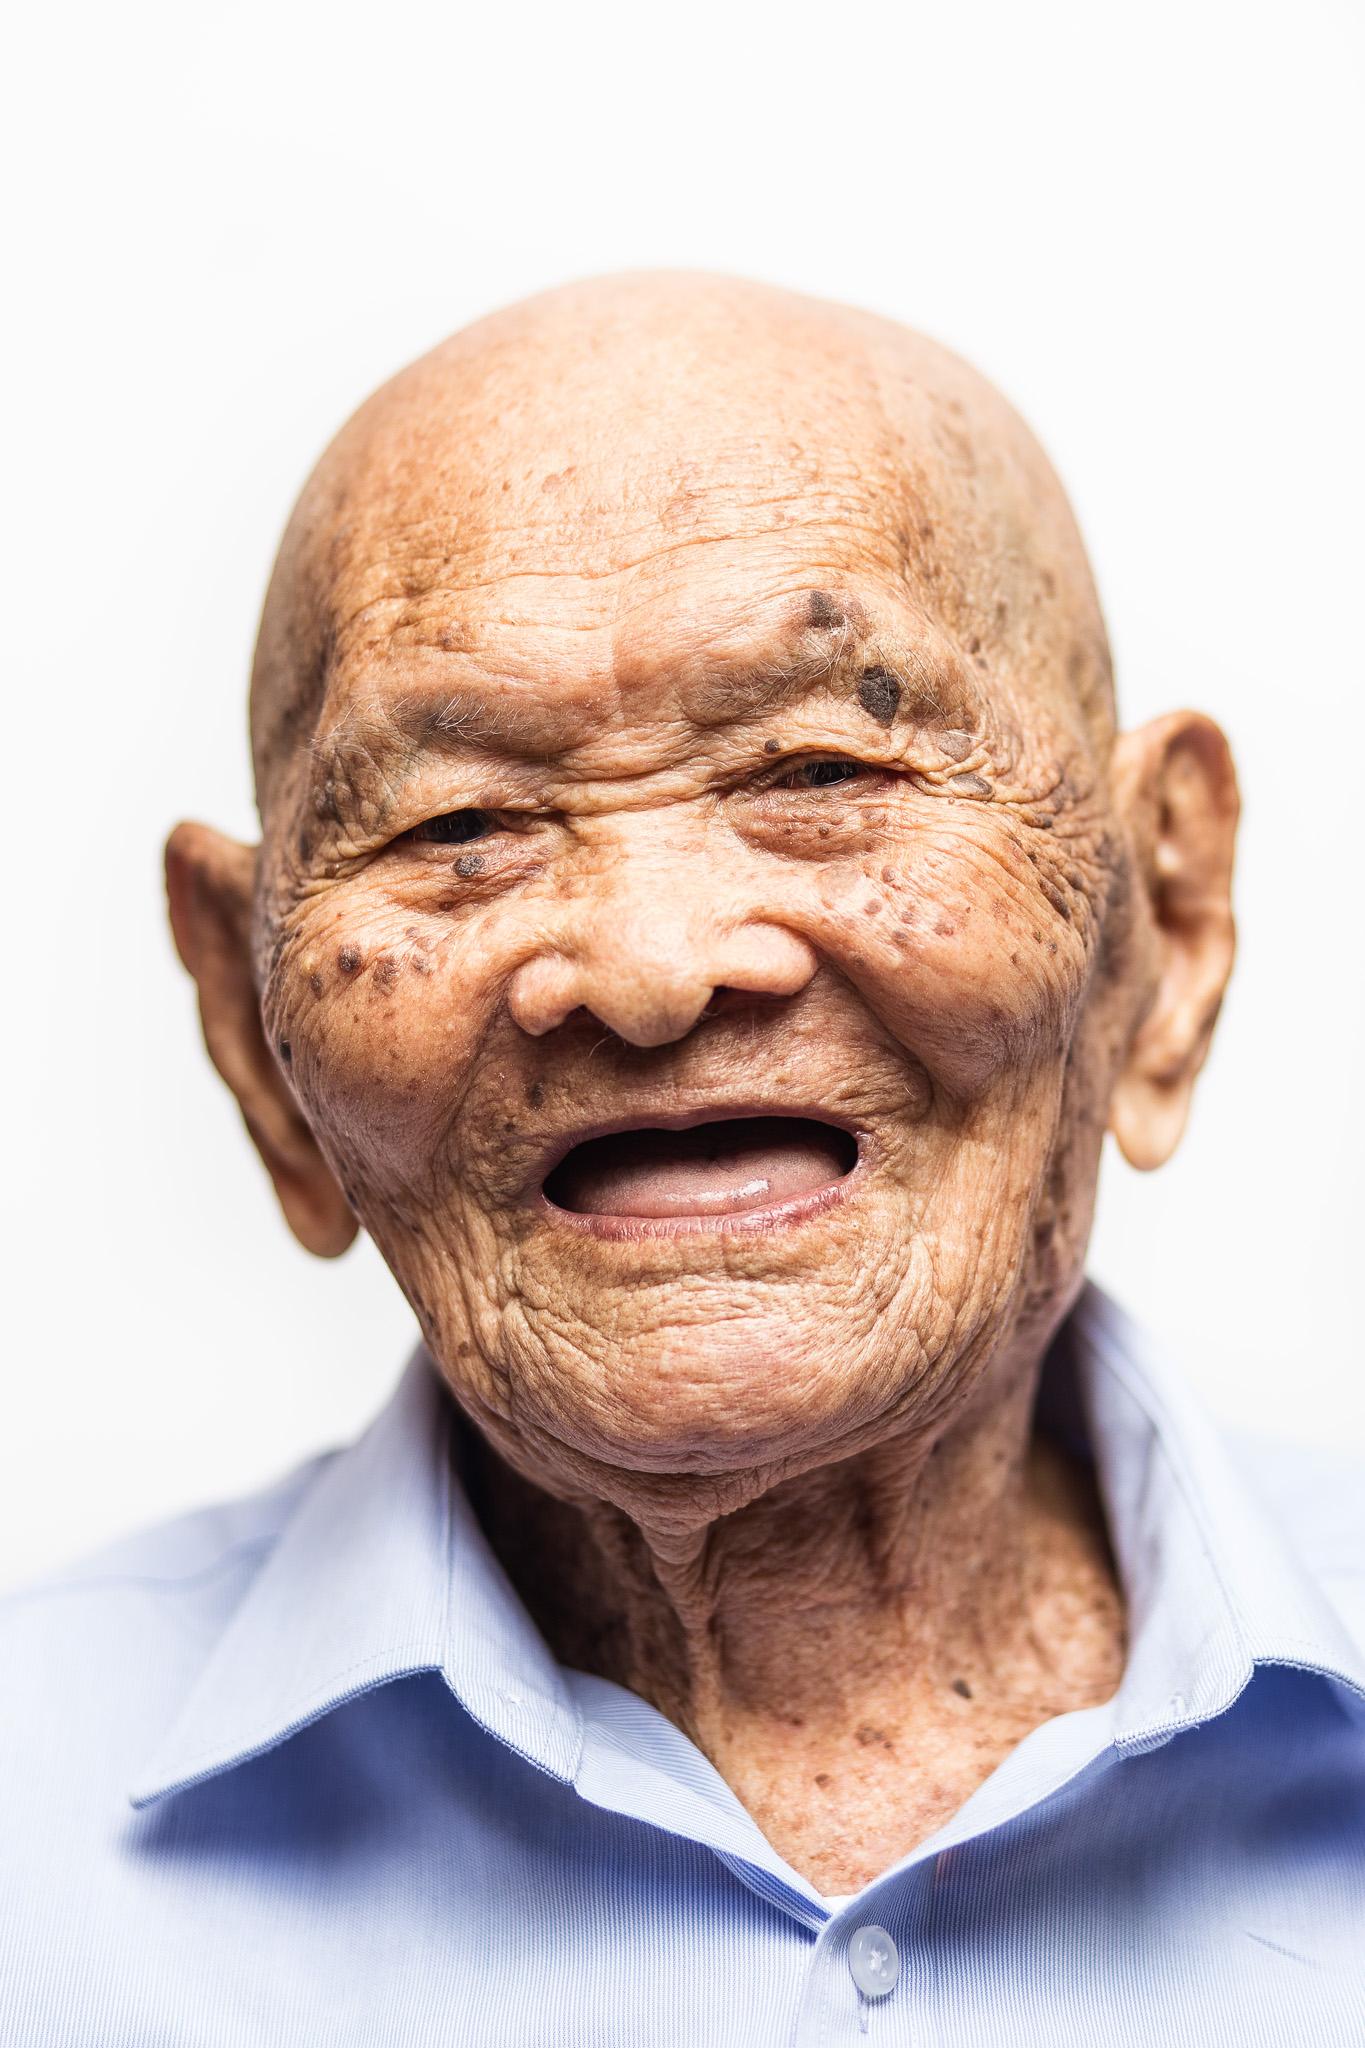 zainal-zainal-studio-centenarians-care-duke-nus-singapore-photographer-17.jpg